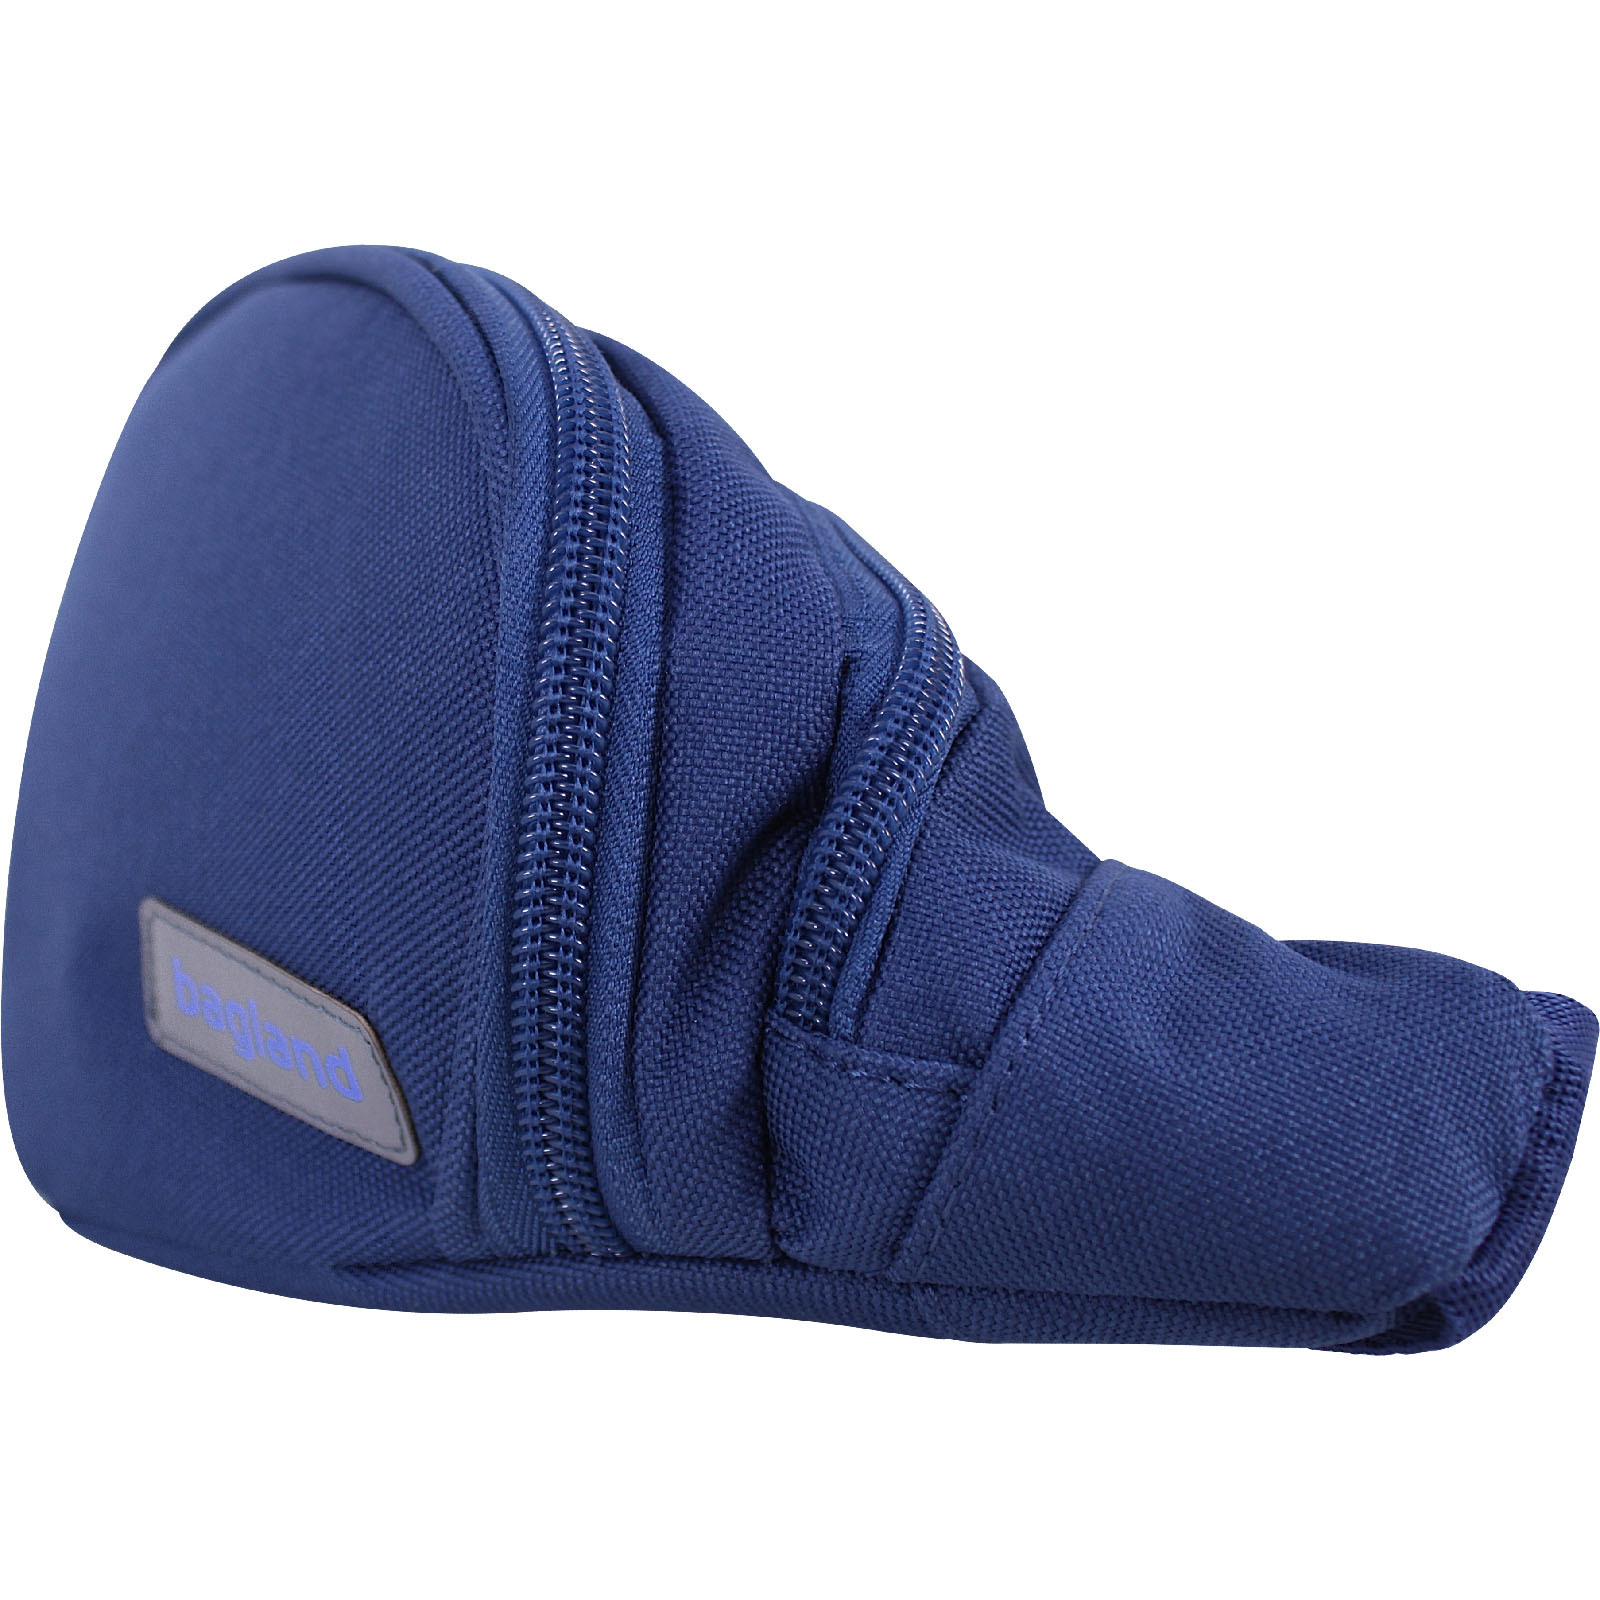 Барсетка Bagland Bella 2 л. синий (0020266)